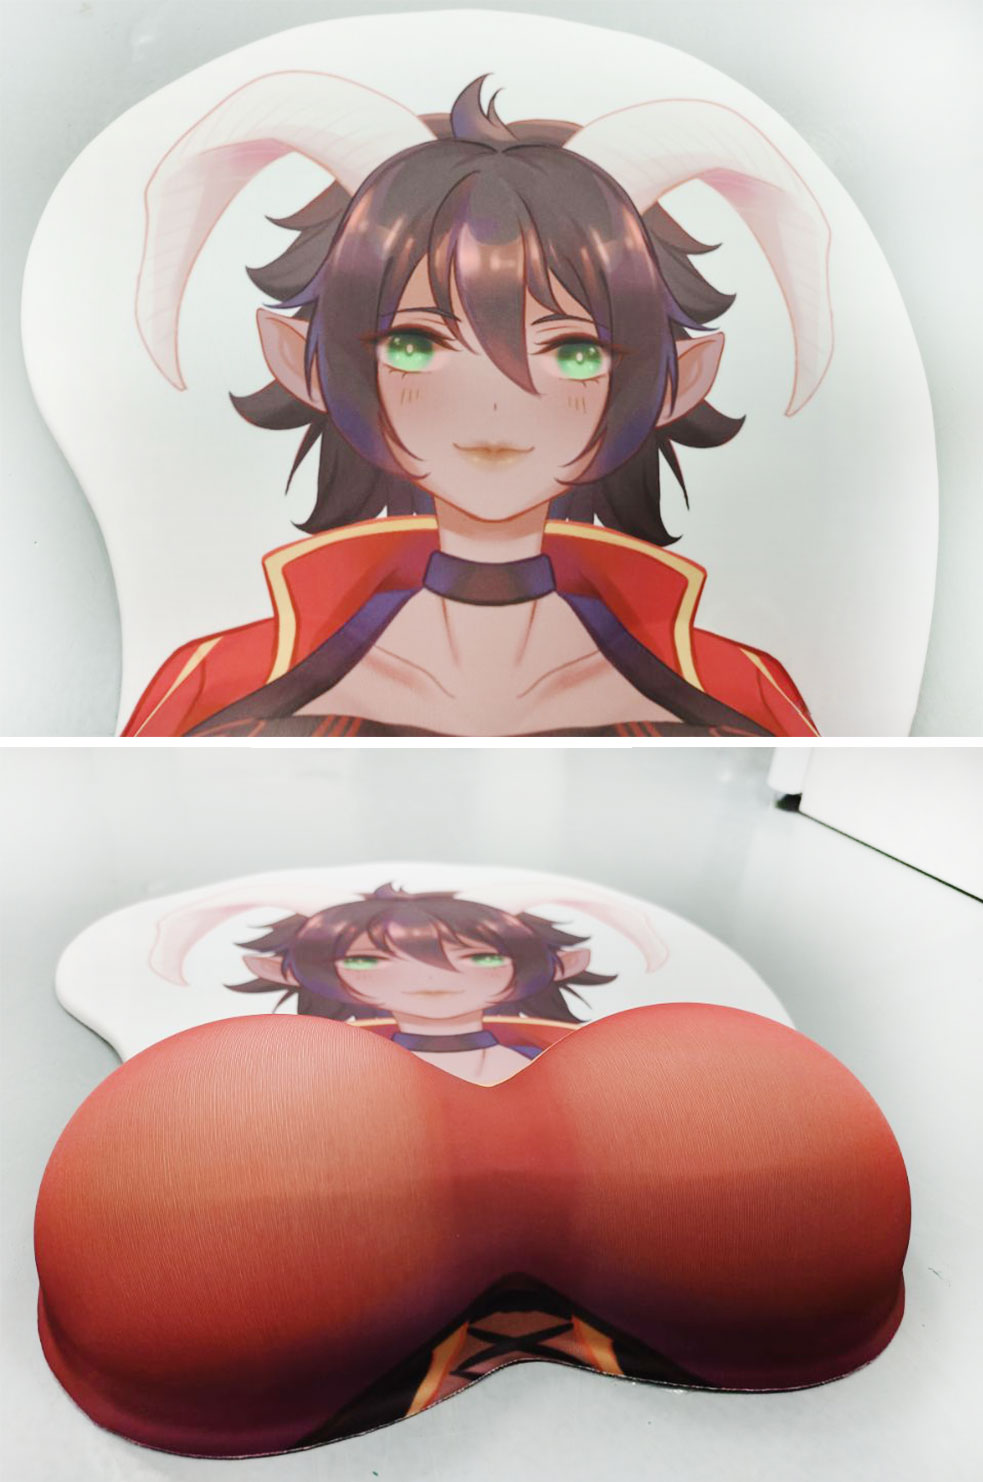 bradamante life size butt mouse pad bradamante giant butt mouse pad 7626 - Anime Mousepads